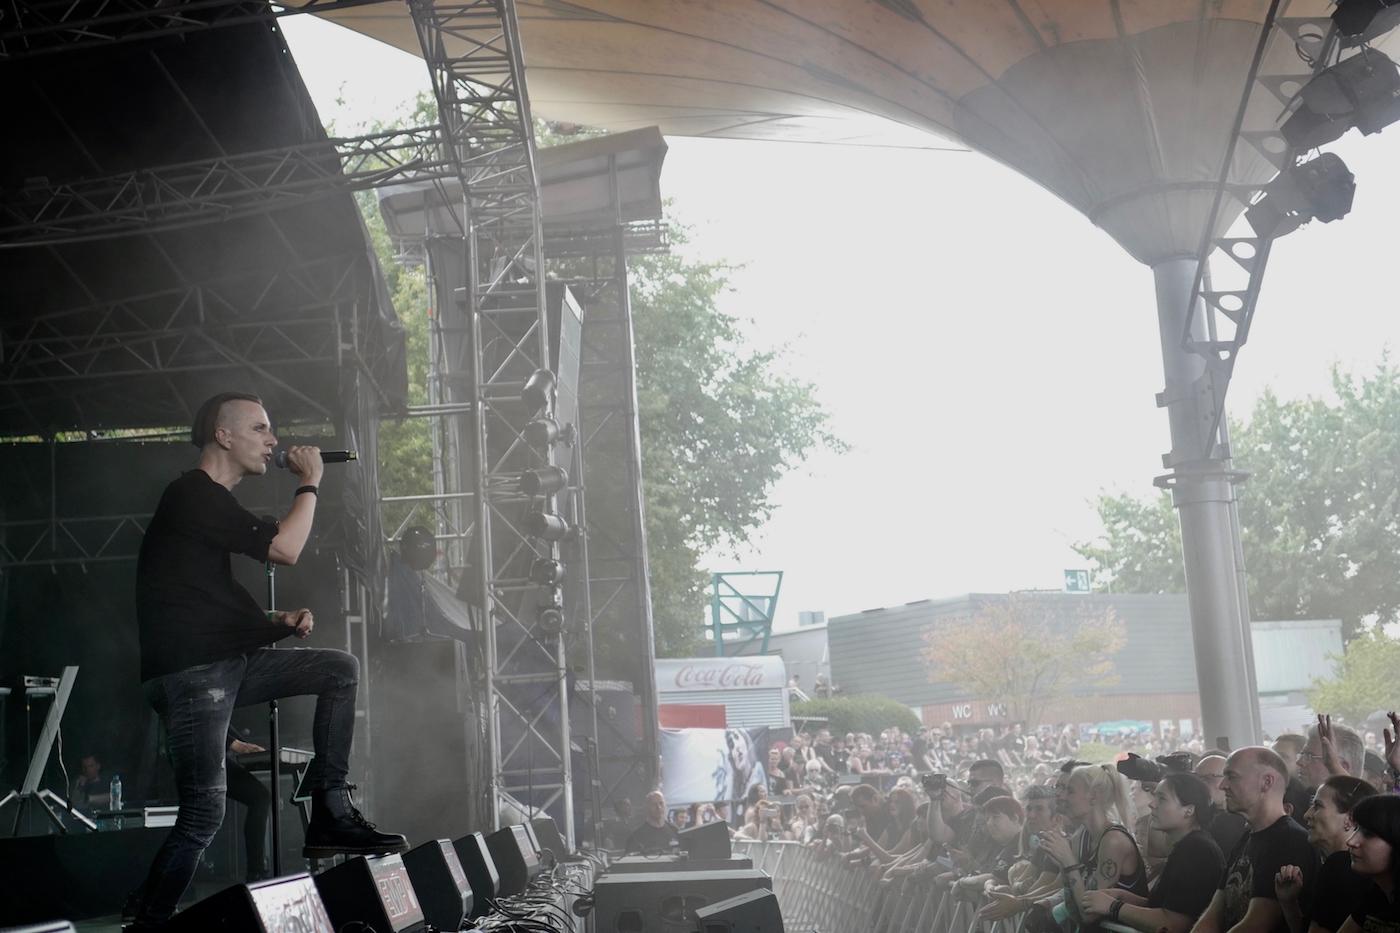 mark_benecke_amphi_festival_koeln_cologne_tanzbrunnen_gothic_OMD_oomph_agonoize_mono_inc_es23_sitd_solar_fake - 150.jpg